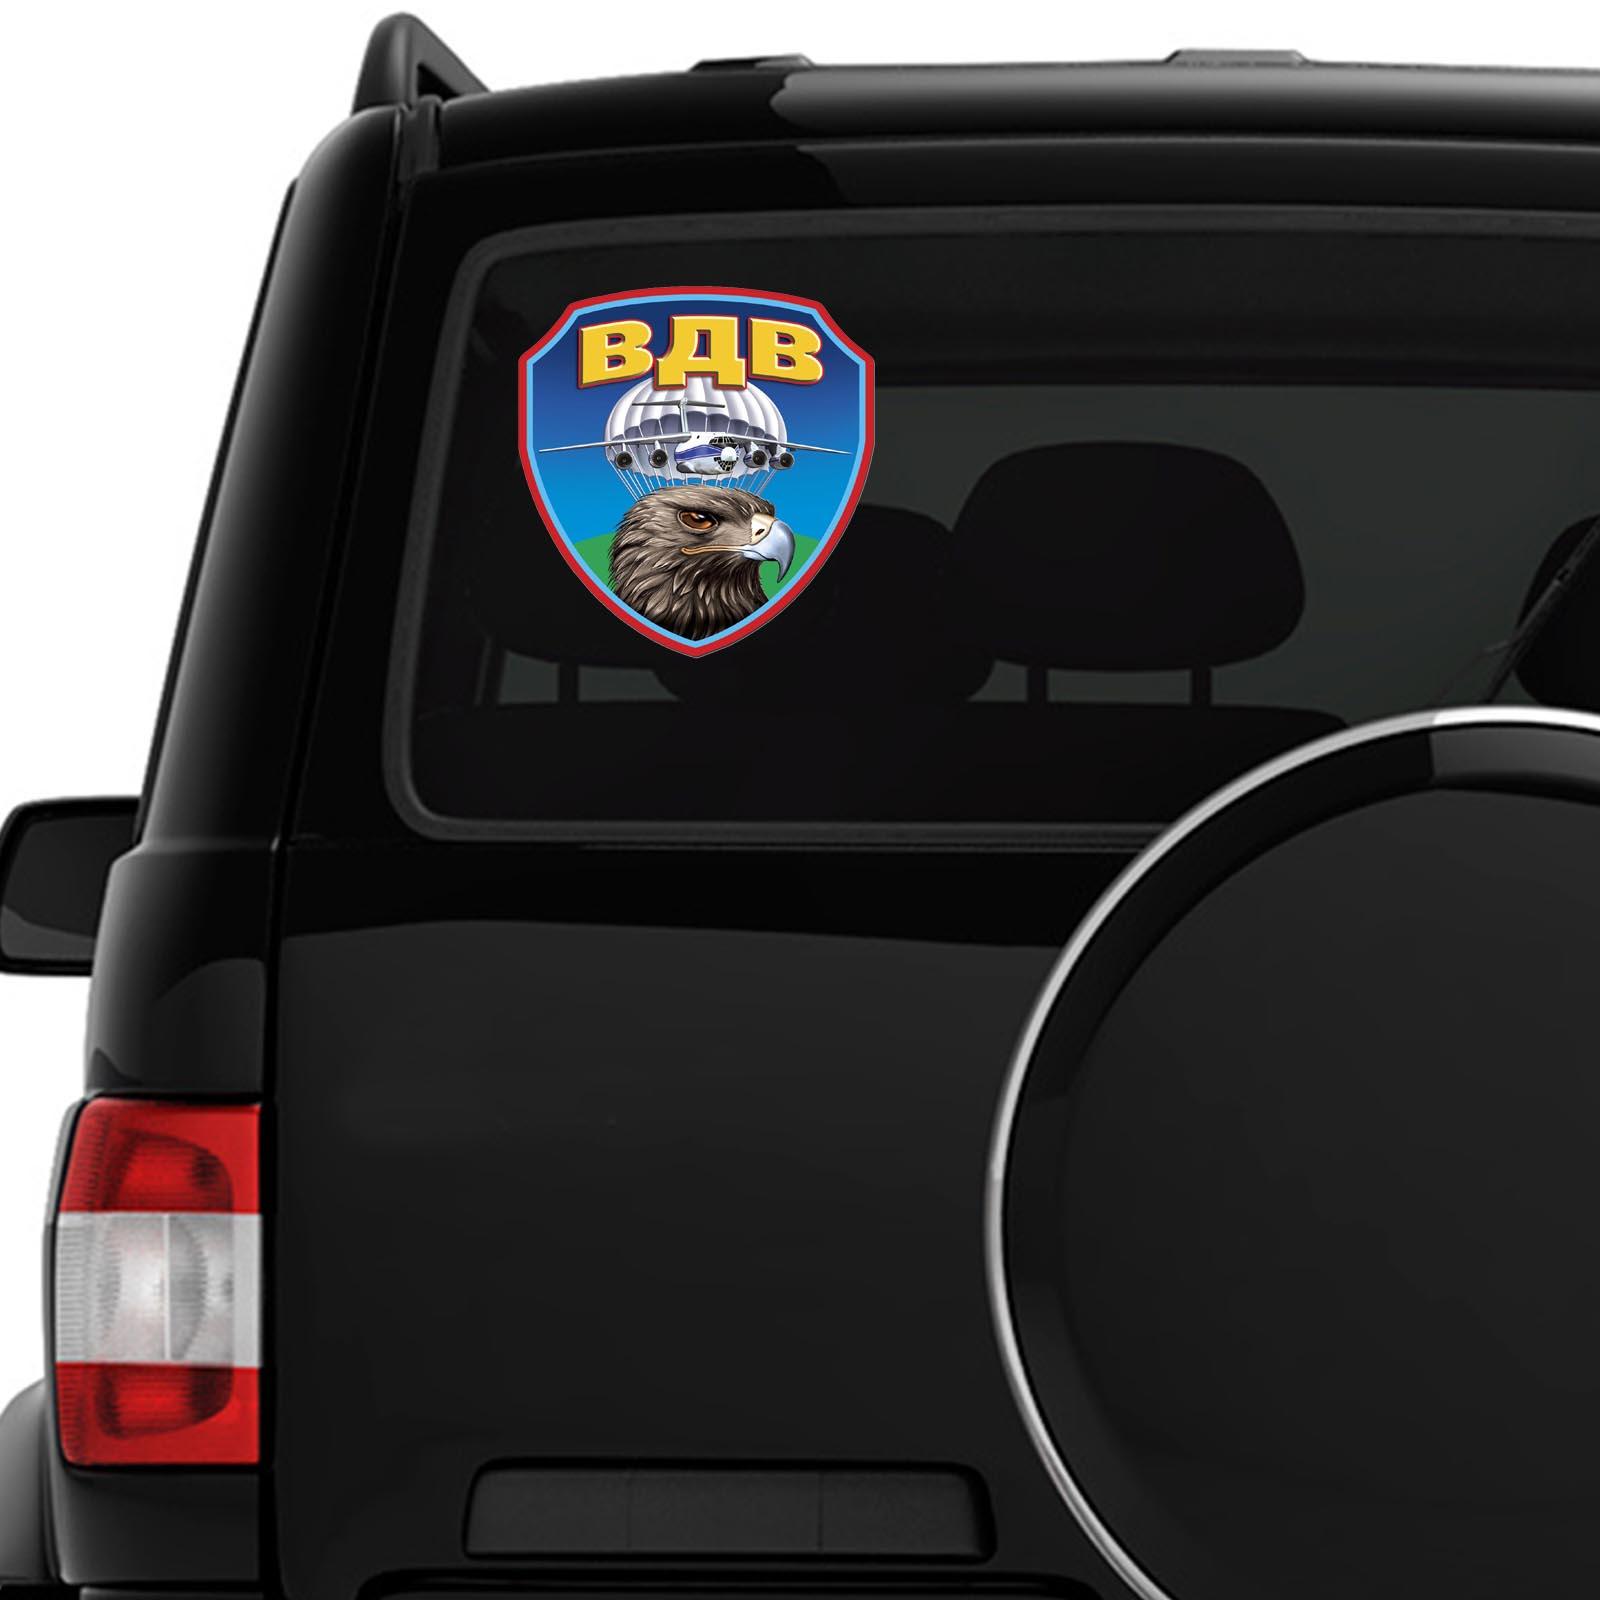 Десантная наклейка ВДВ на стекло авто за 49 руб.